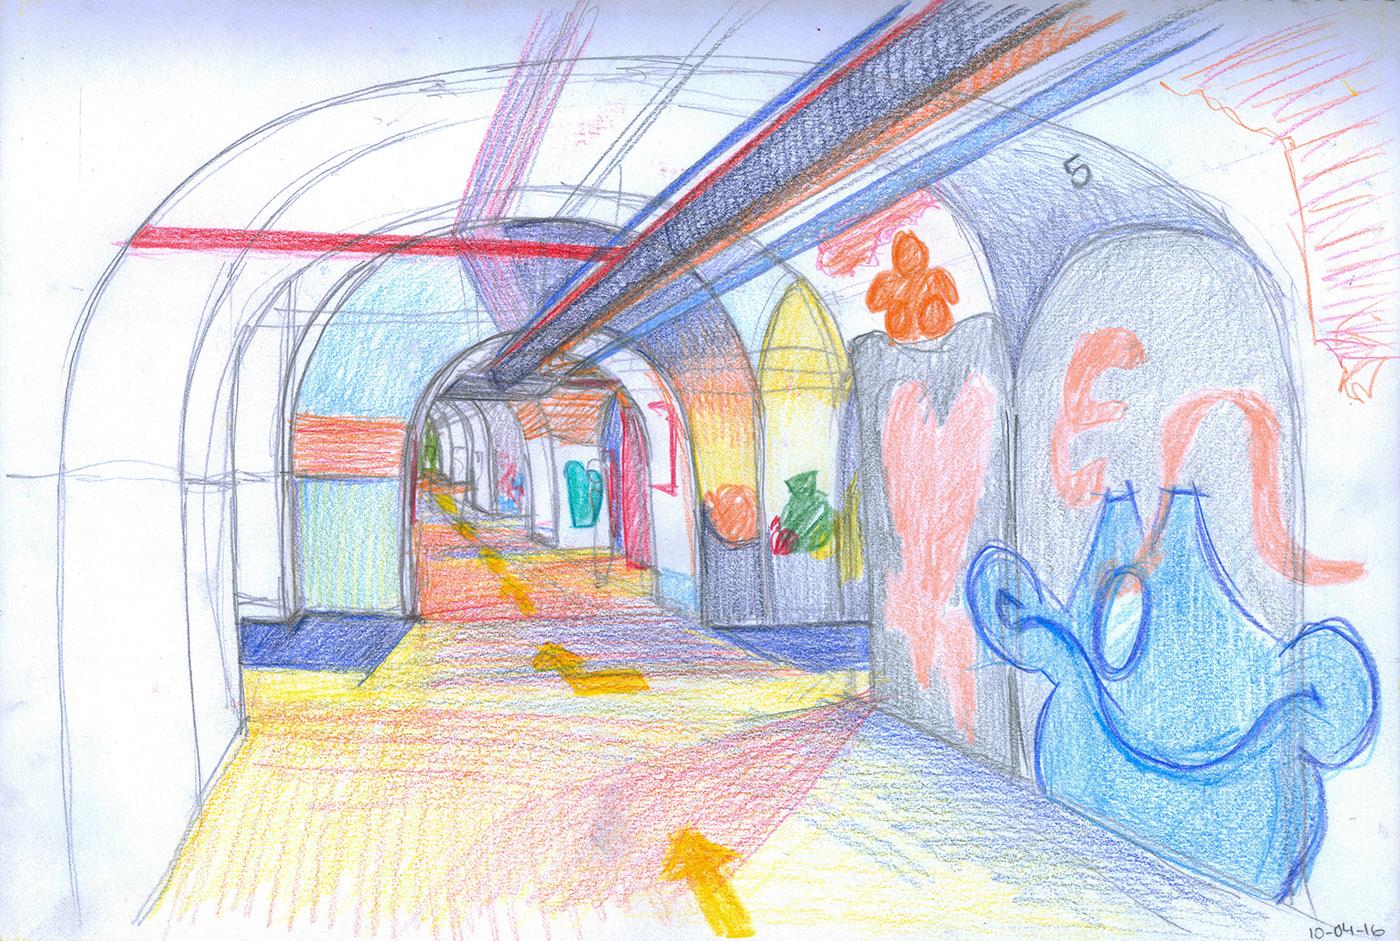 Tabacalera madrid arquitectura collage color watercolor gouache pincel lapices de colores centro social autogestionado centro cultural